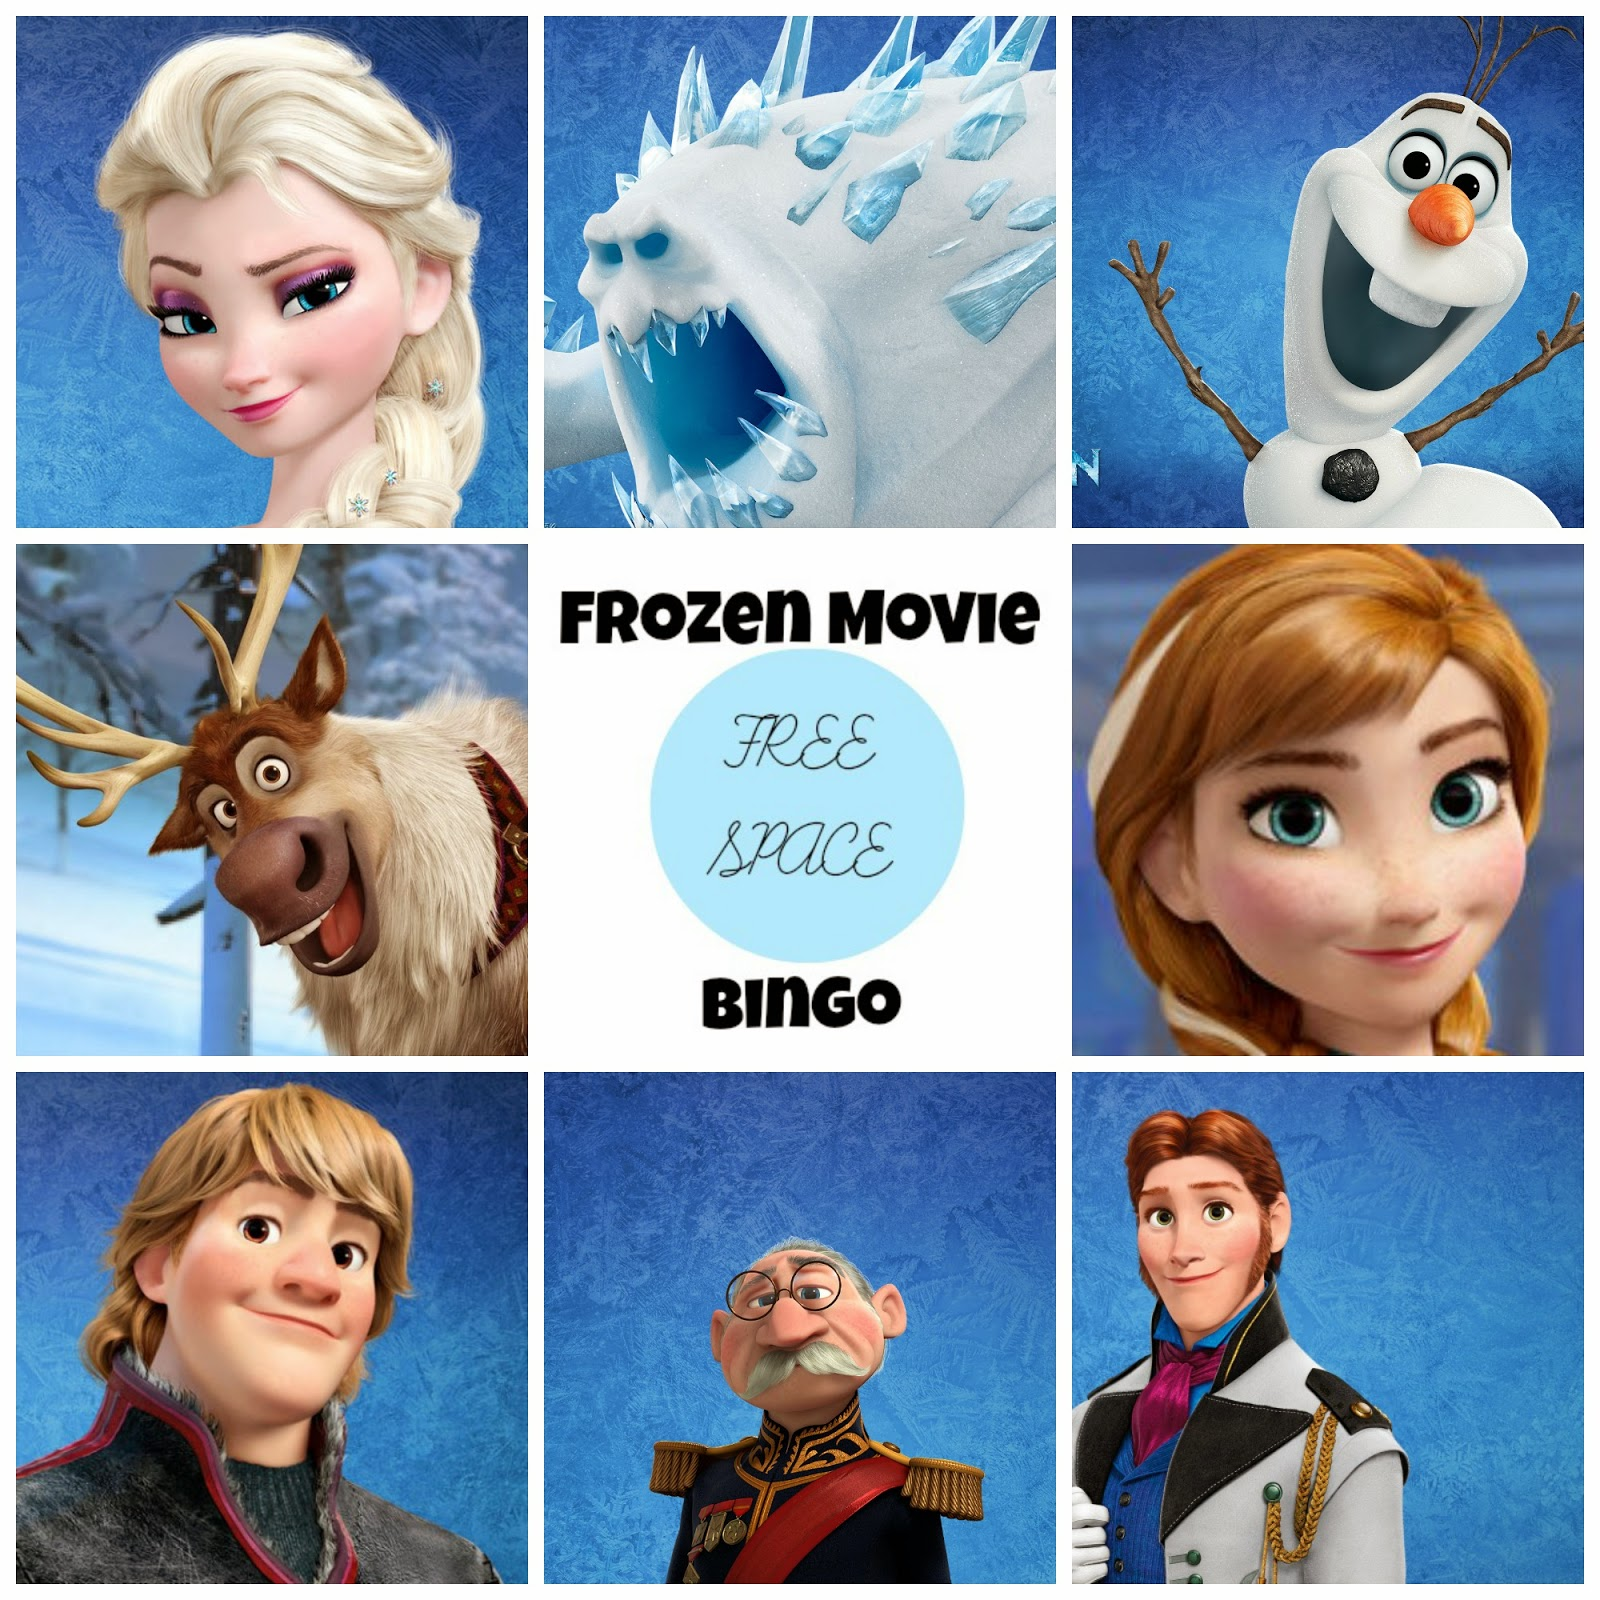 Frozen Free Printable Bingo Oh My Fiesta In English